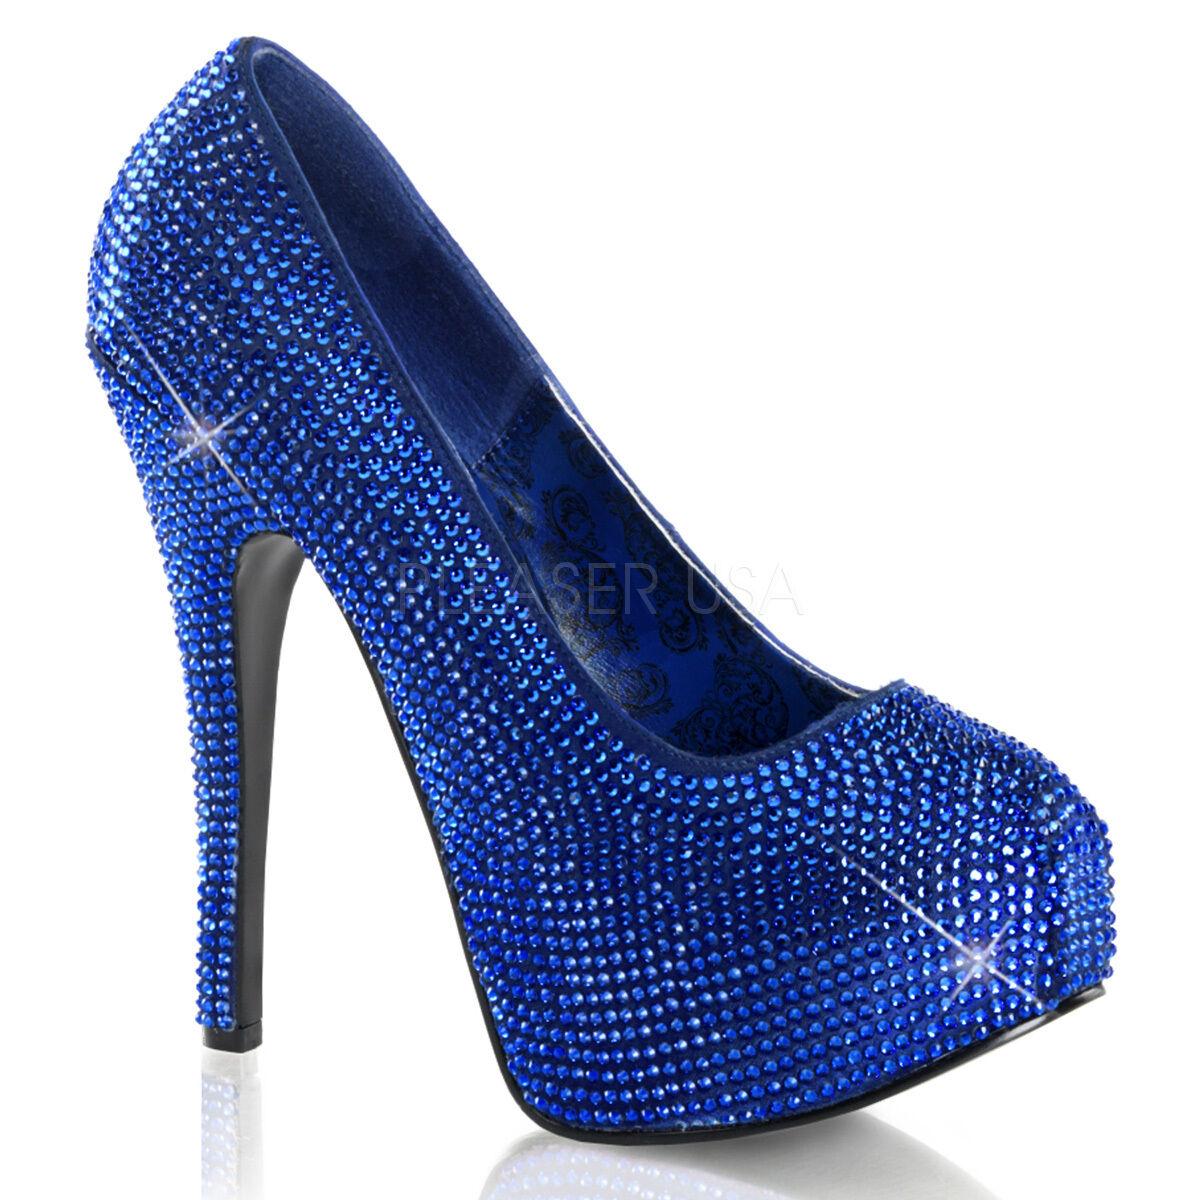 Burdel teeze-06r Royal Azul Satinado Rhinestone Rhinestone Rhinestone Cubiertos 6  Tacones Zapatos De Plataforma